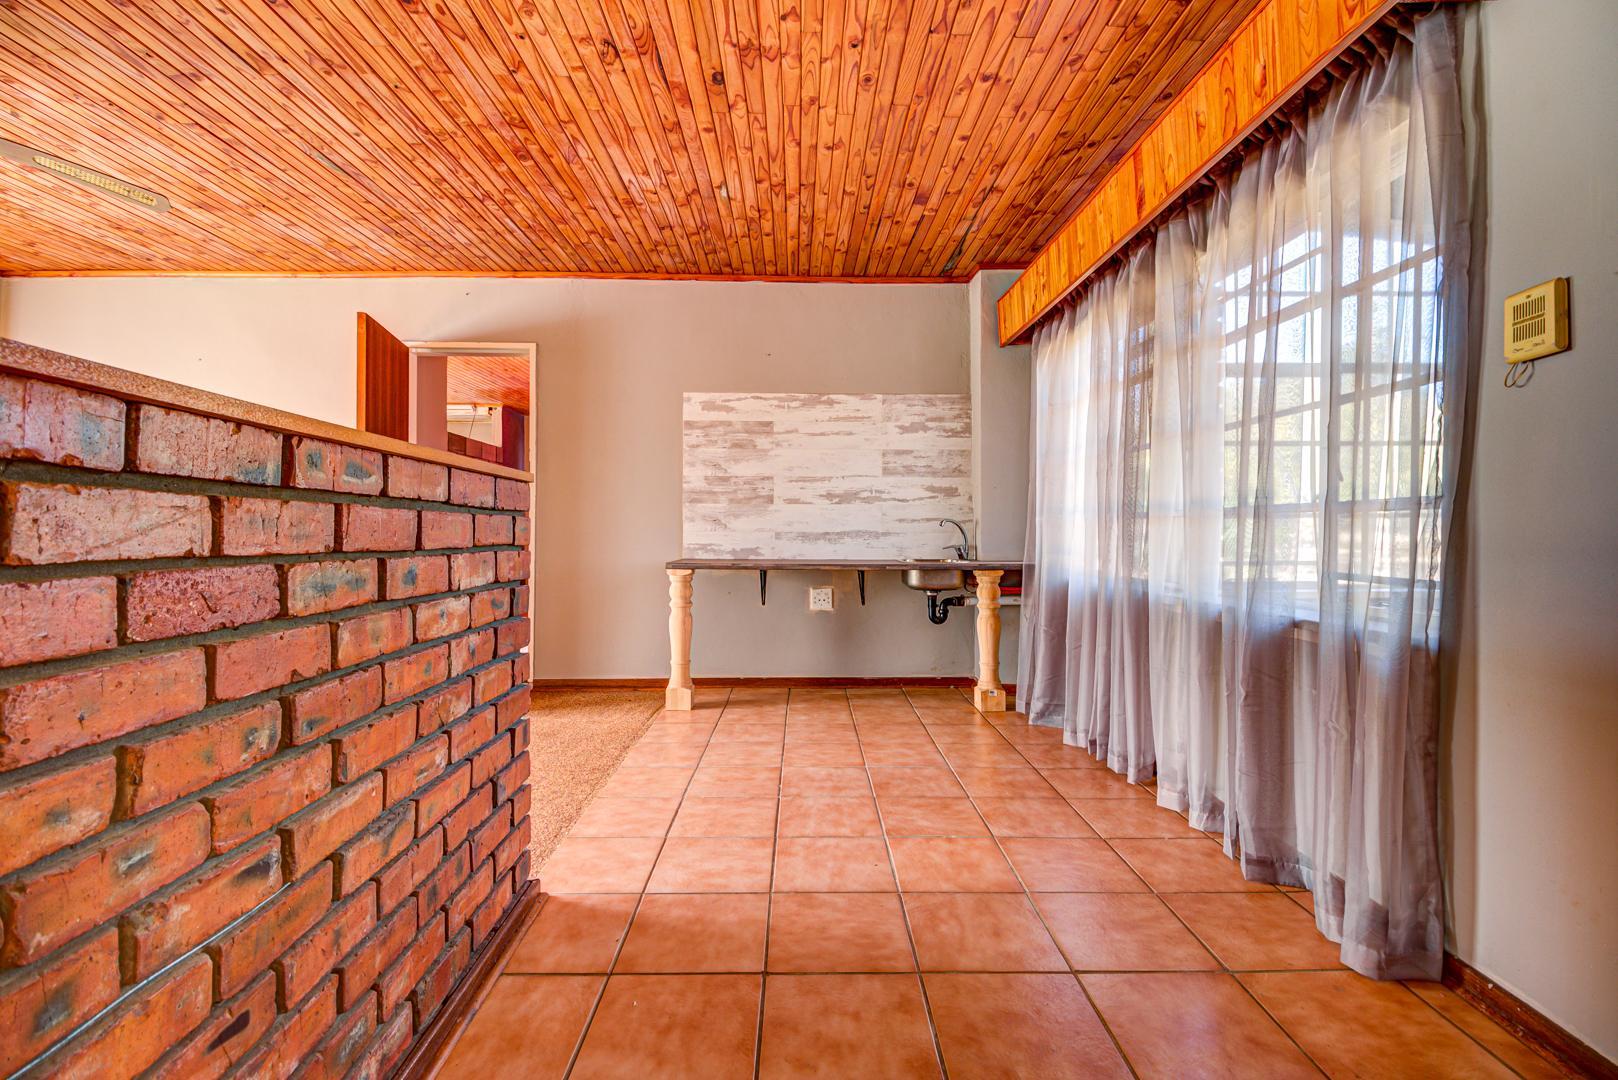 5 Bedroom House For Sale in Nestpark AH